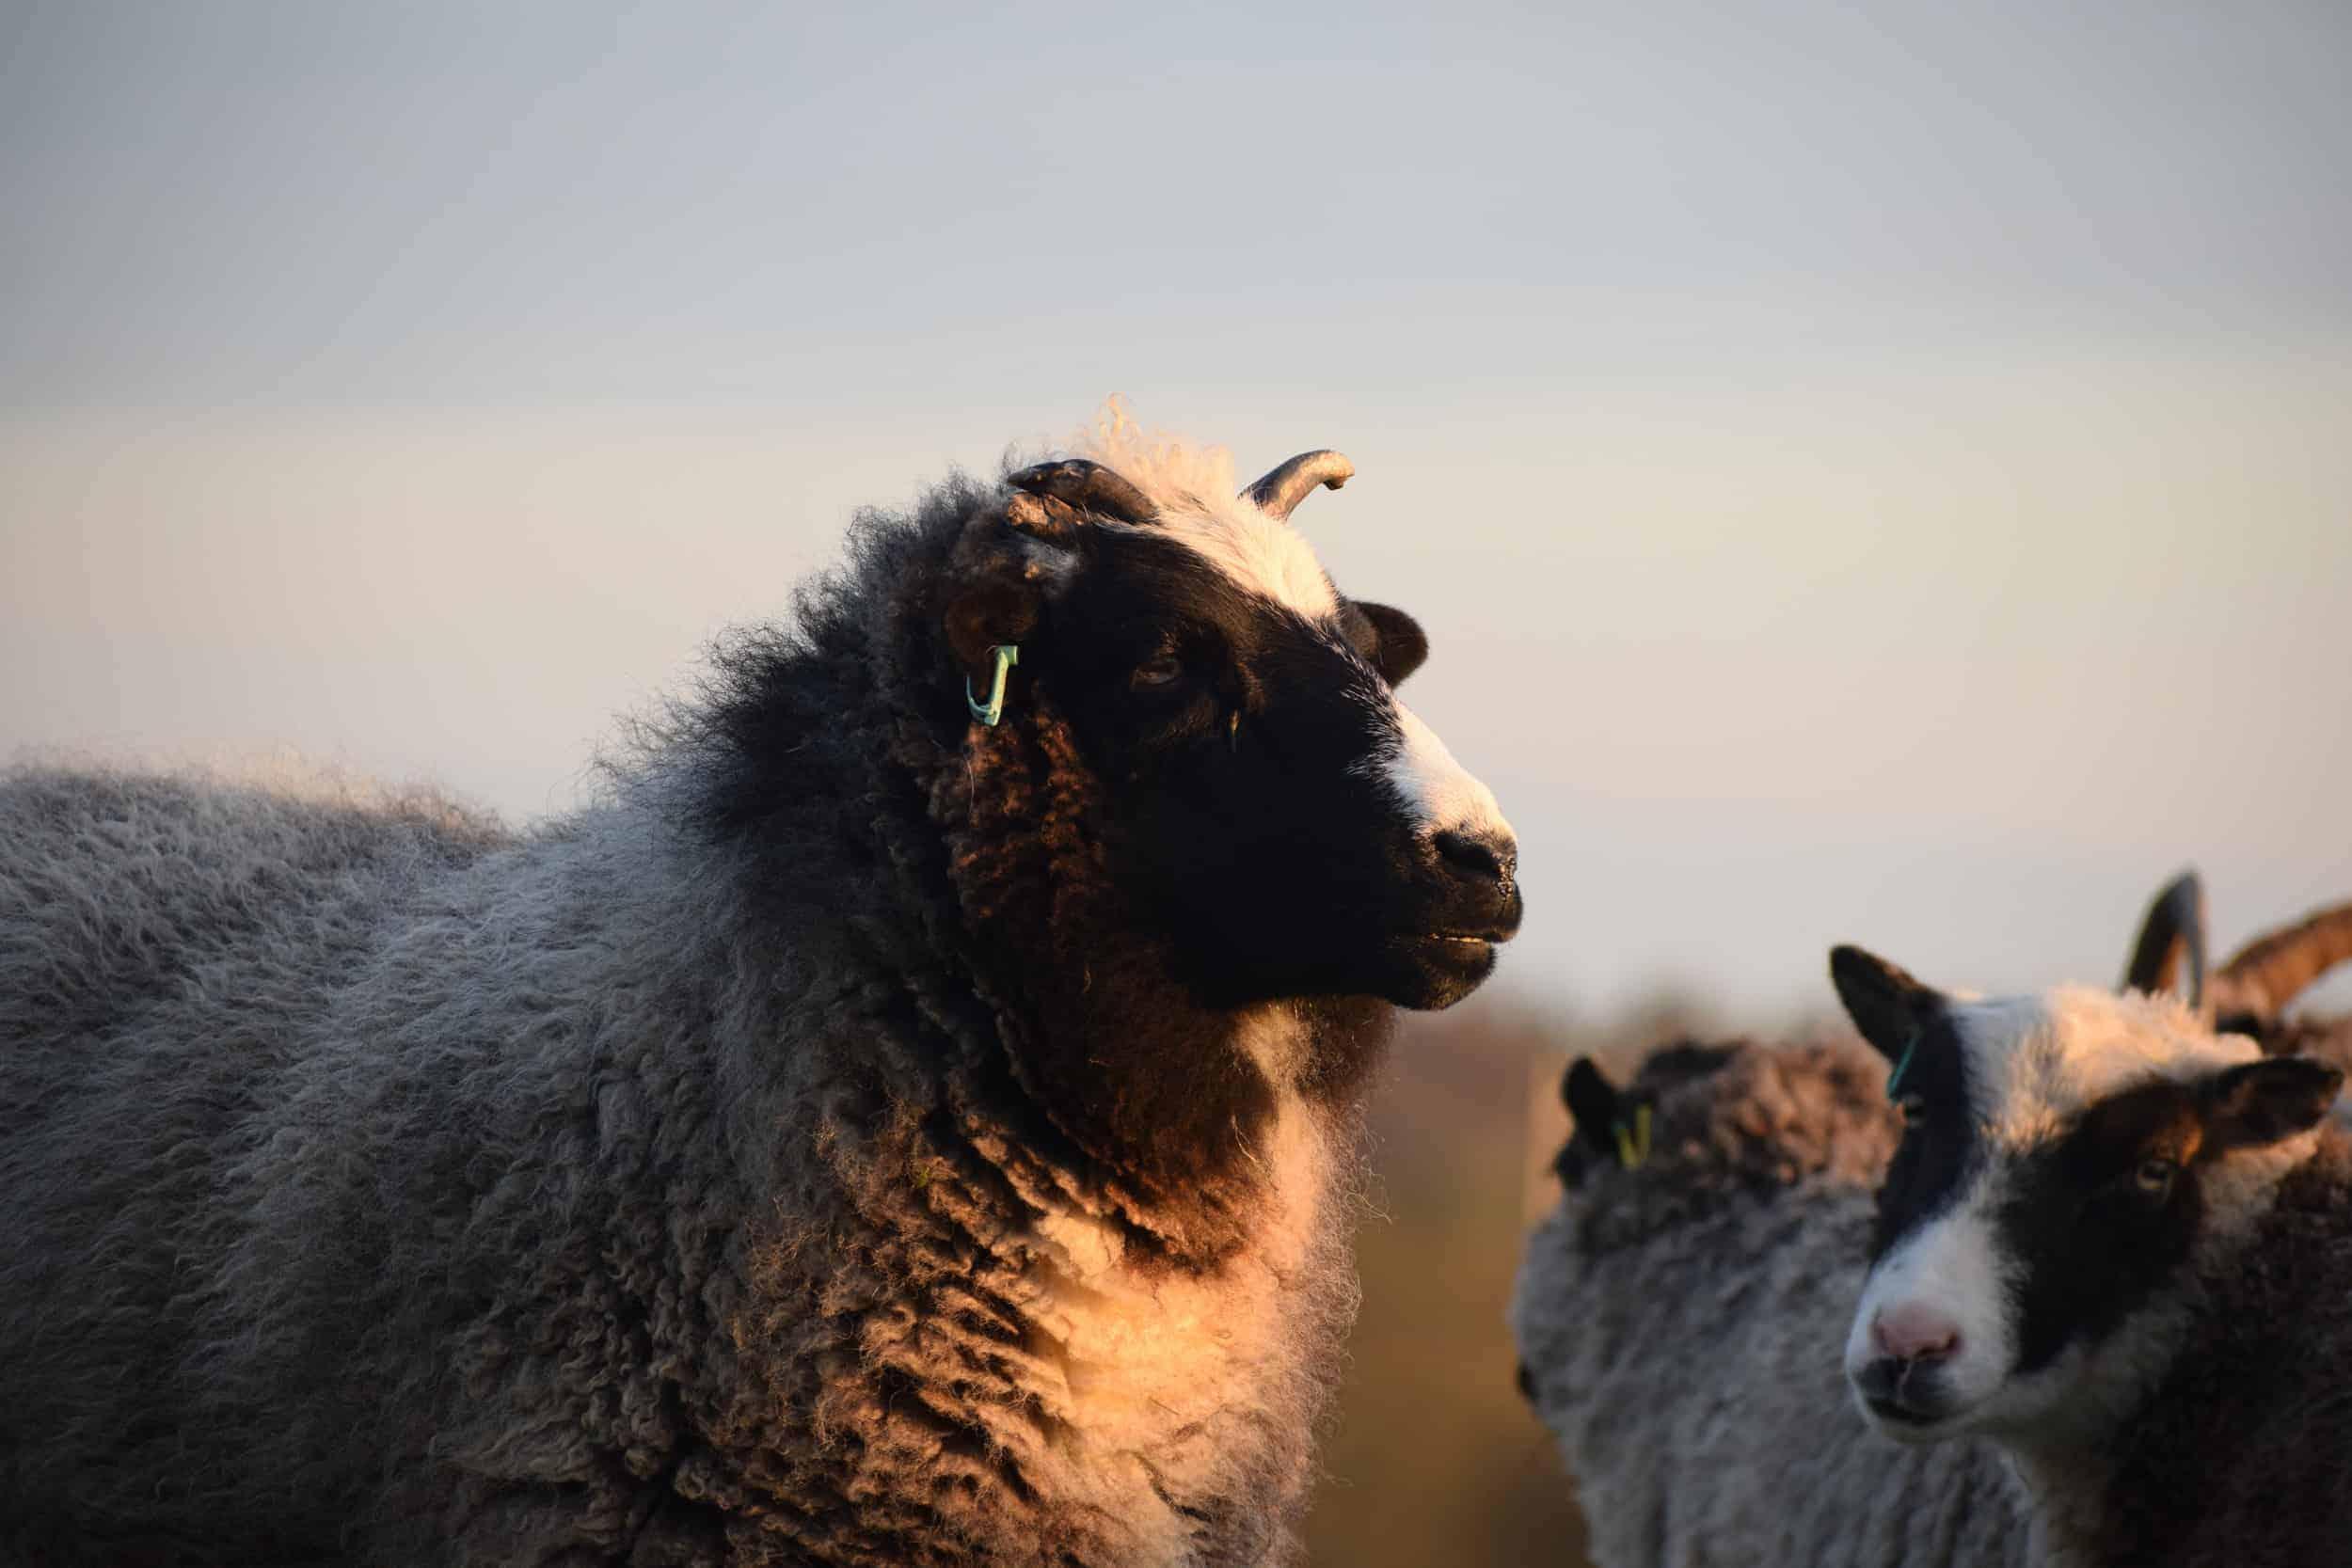 Holly sunset pet lamb sheep jacob cross shetland spotted black grey white wales gwynedd british wool gifts homeware